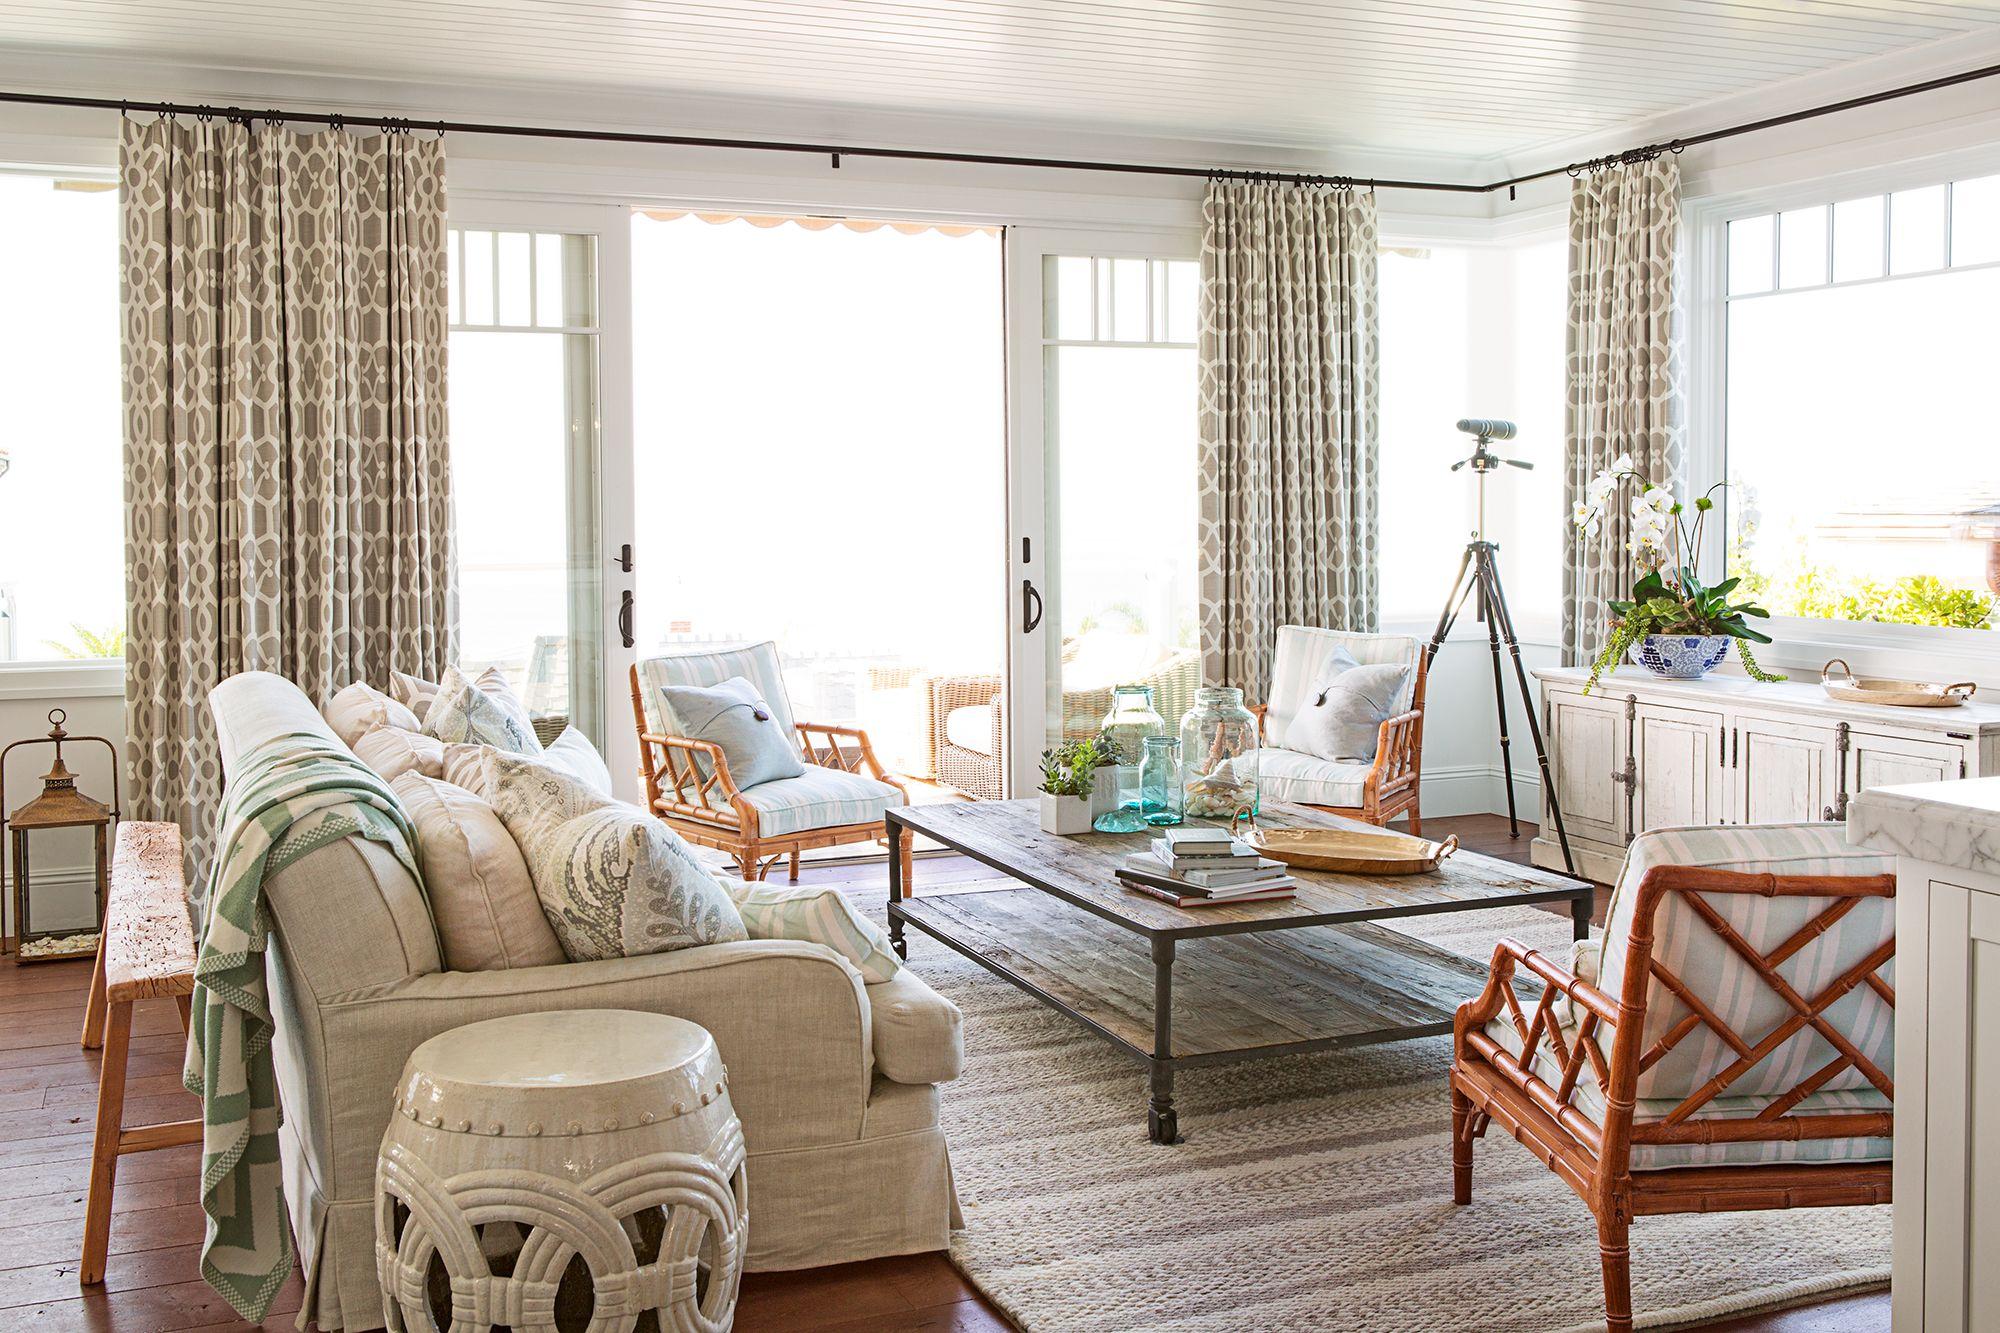 Interior Curtain Ideas for Living Room